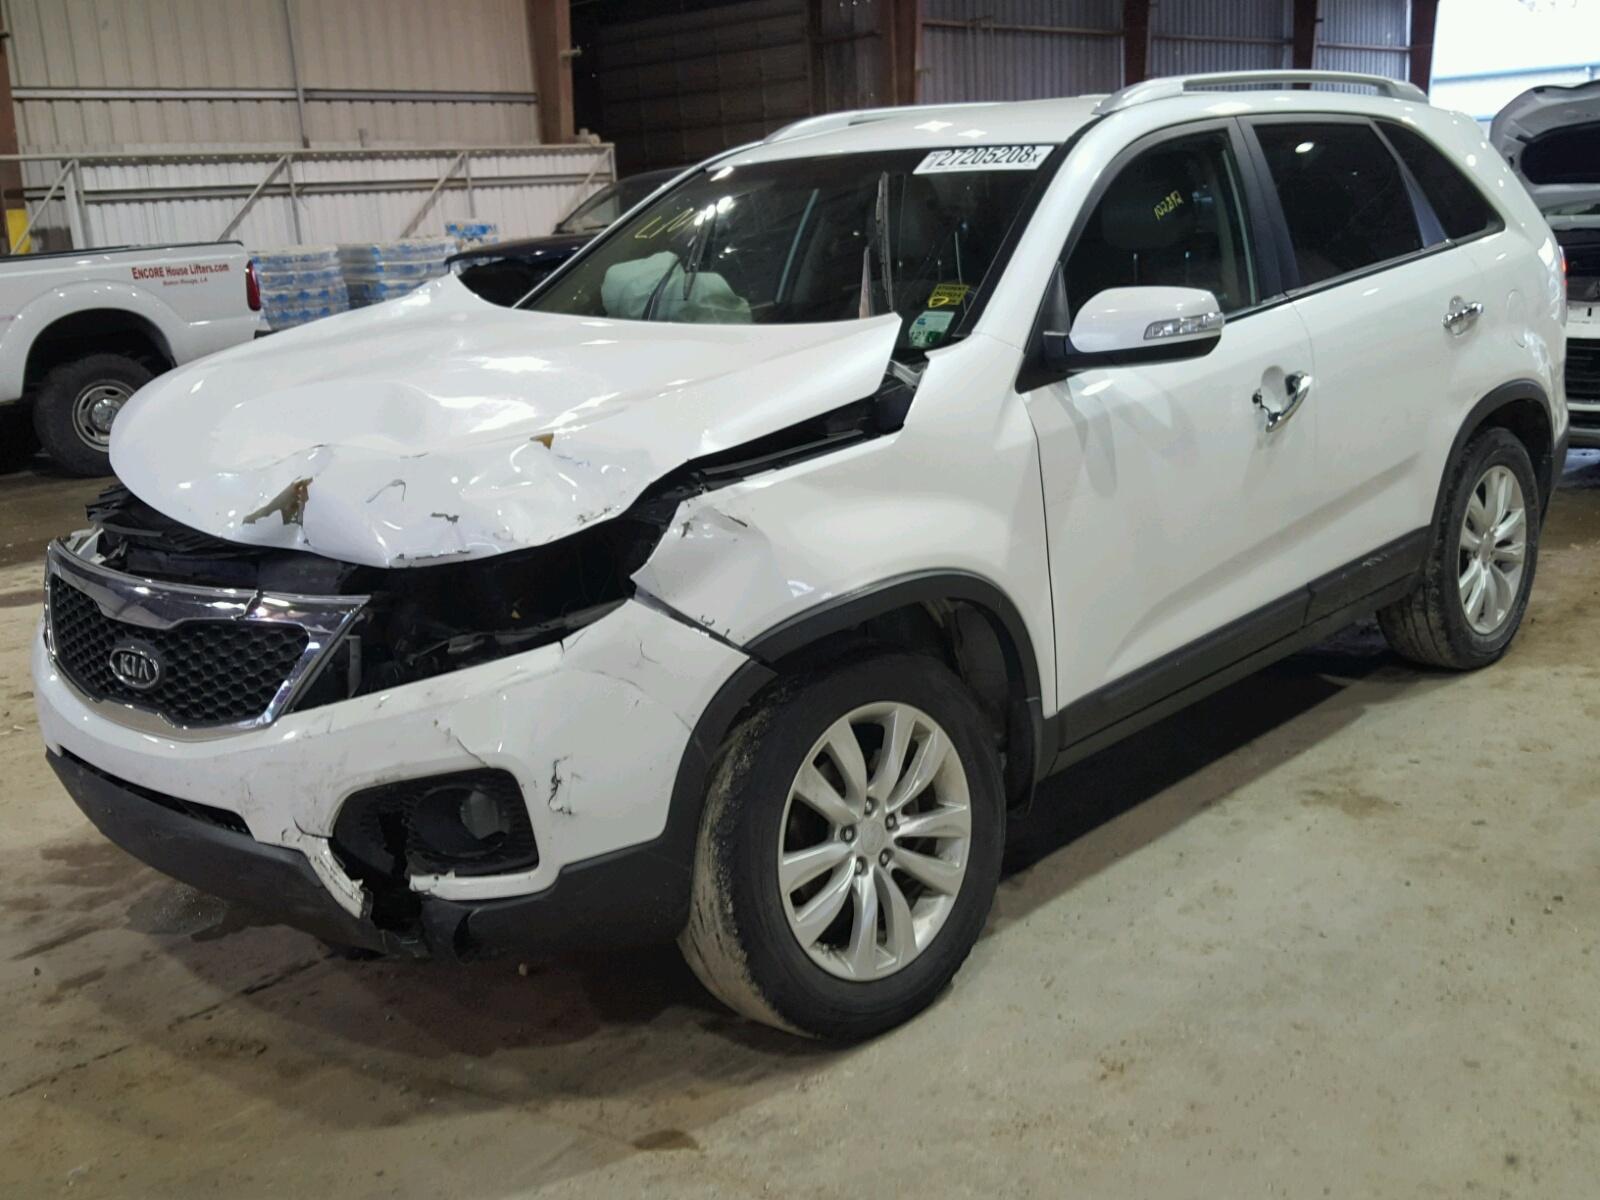 baton title la of online sale auto copart certificate on view kia lot sportage red carfinder in auctions en left rouge